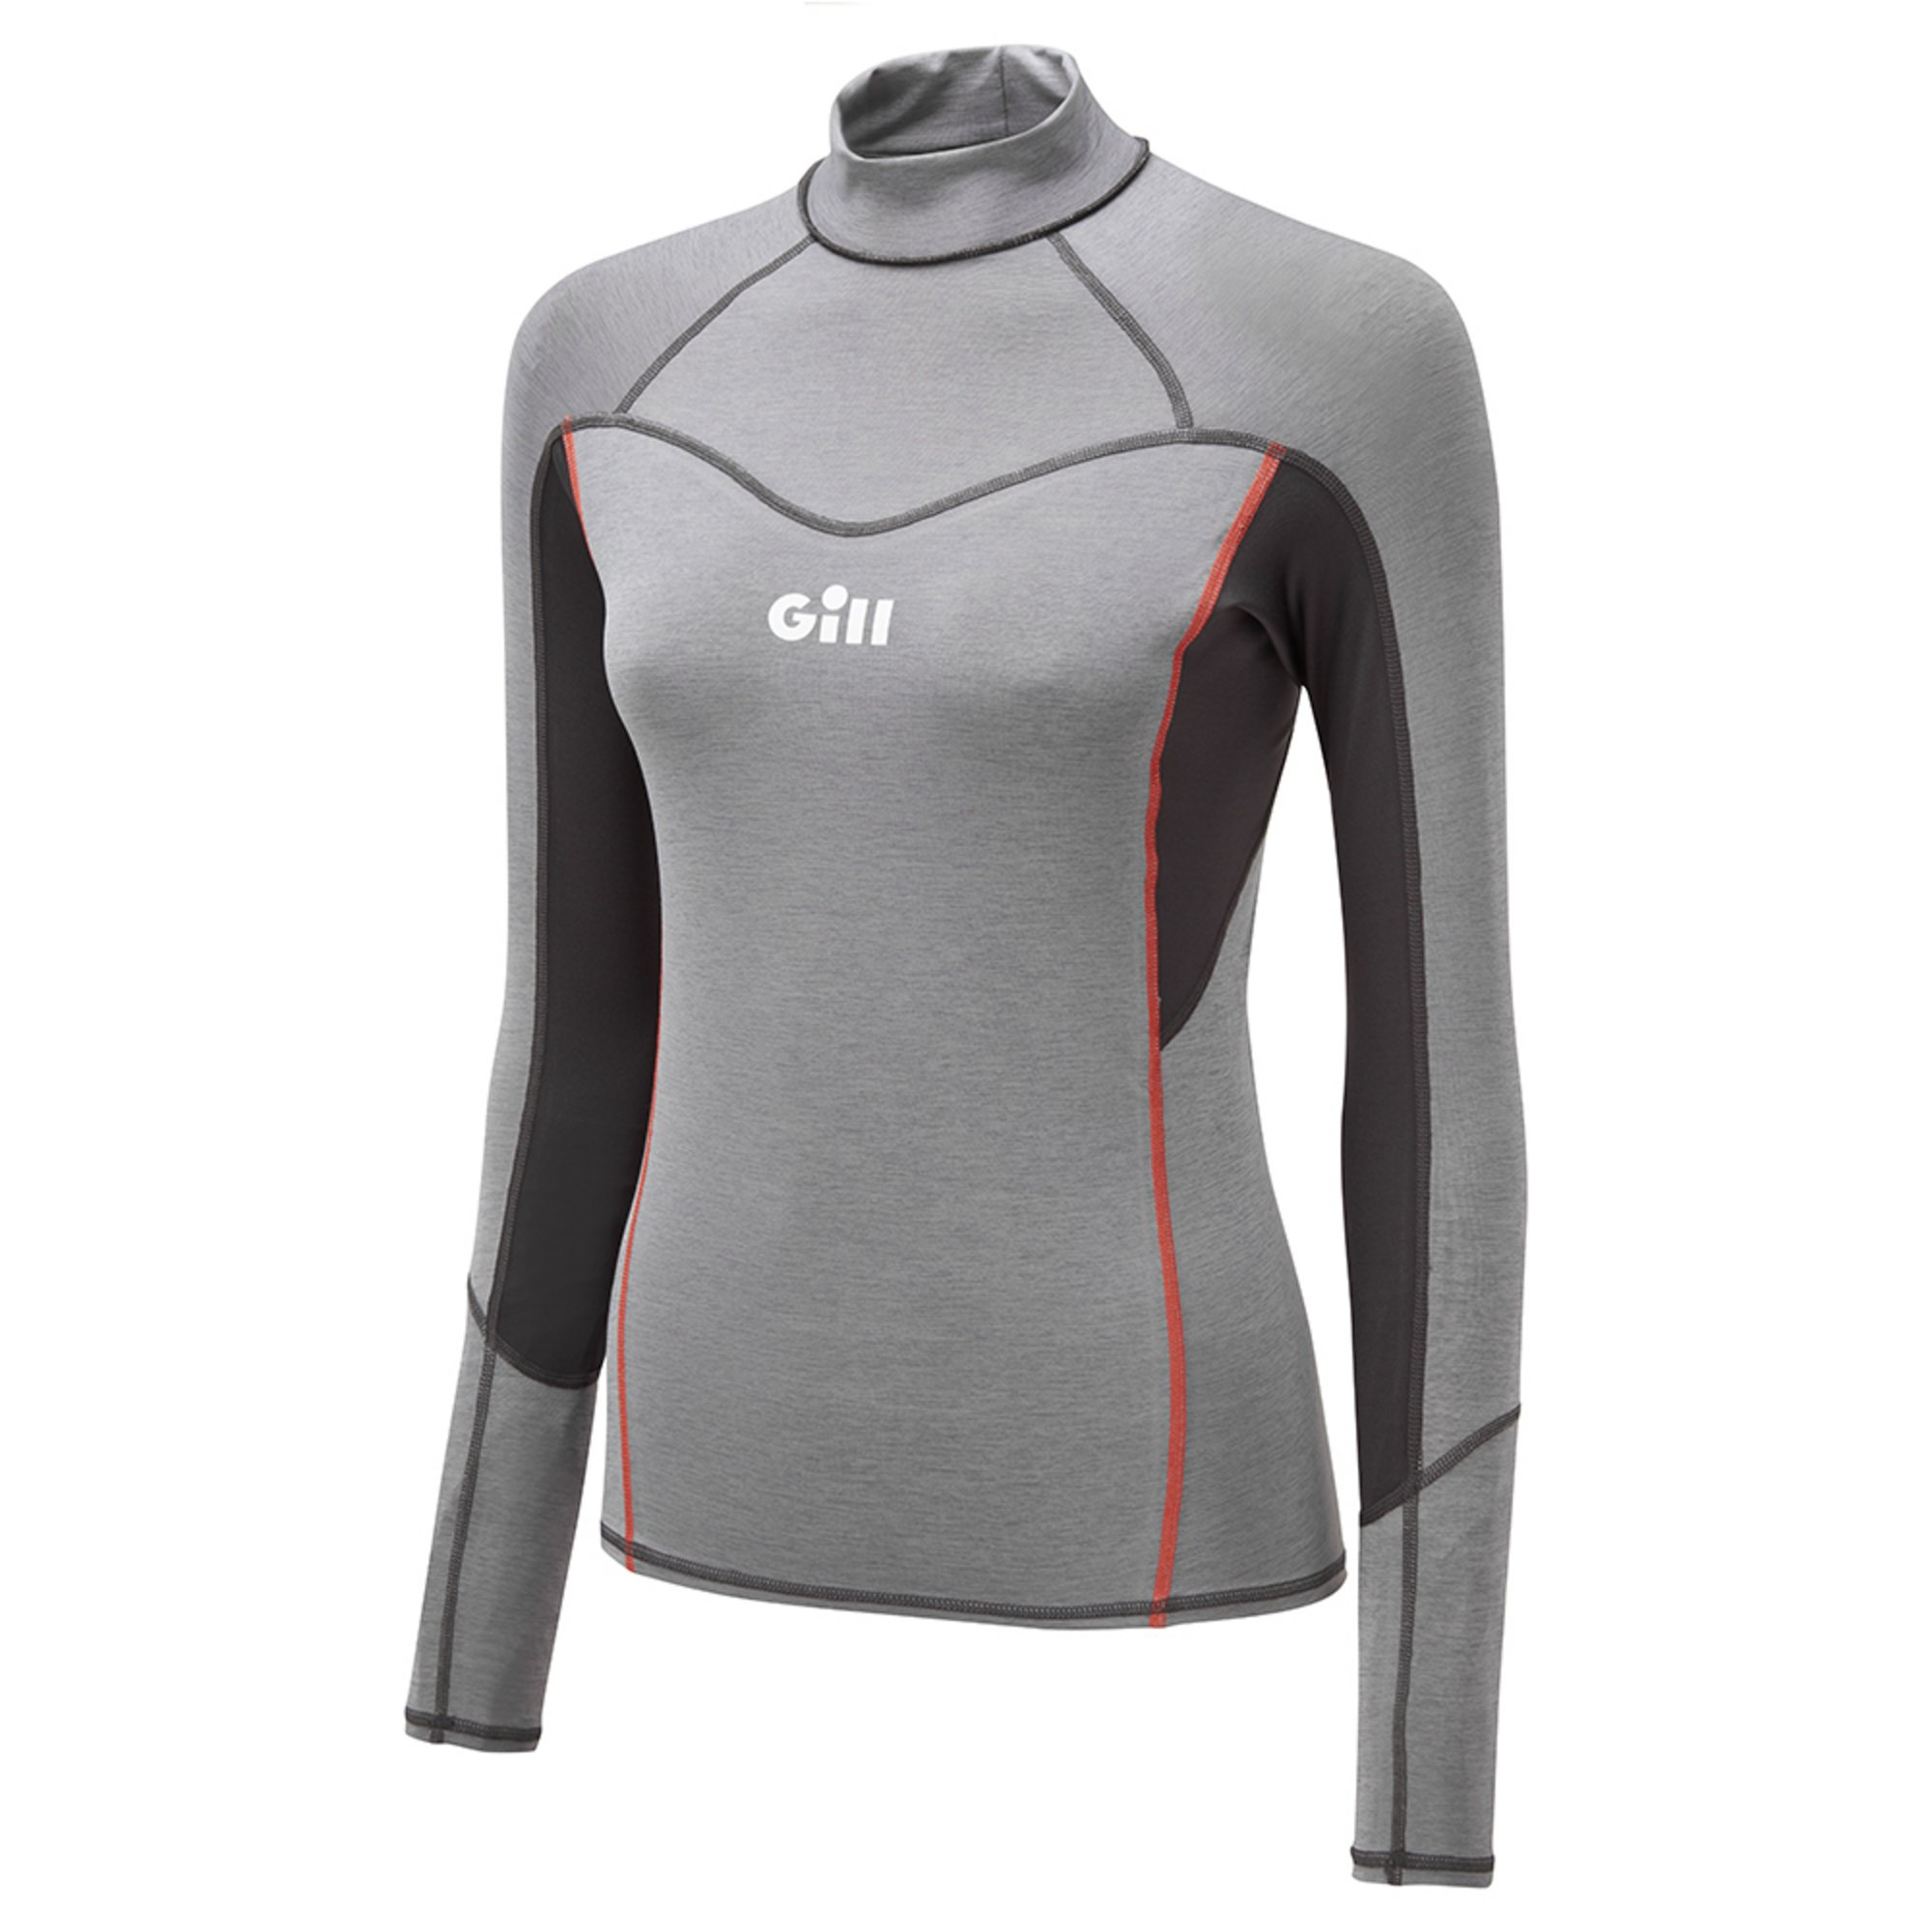 Eco Pro Rash Vest für Damen - 5025W-GRE18_3.jpg